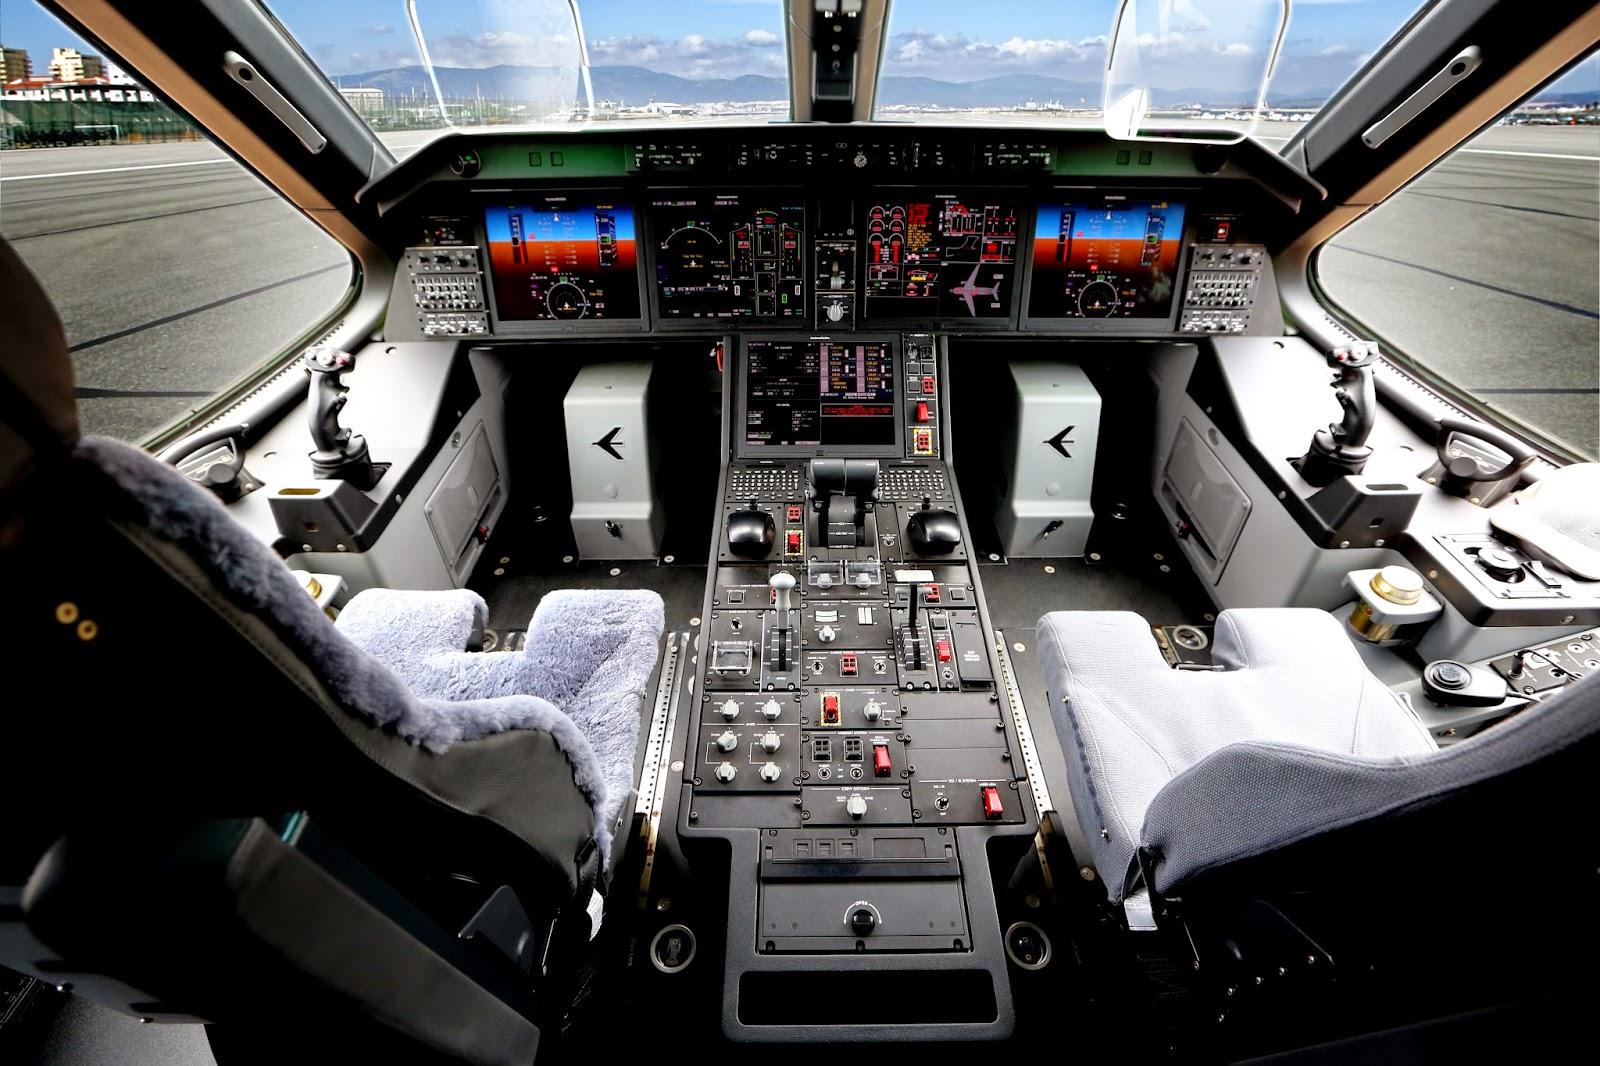 EMBRAER KC-390  - Página 39 Pro%2BLine%2BFusion%2Bon%2BKC%2B390